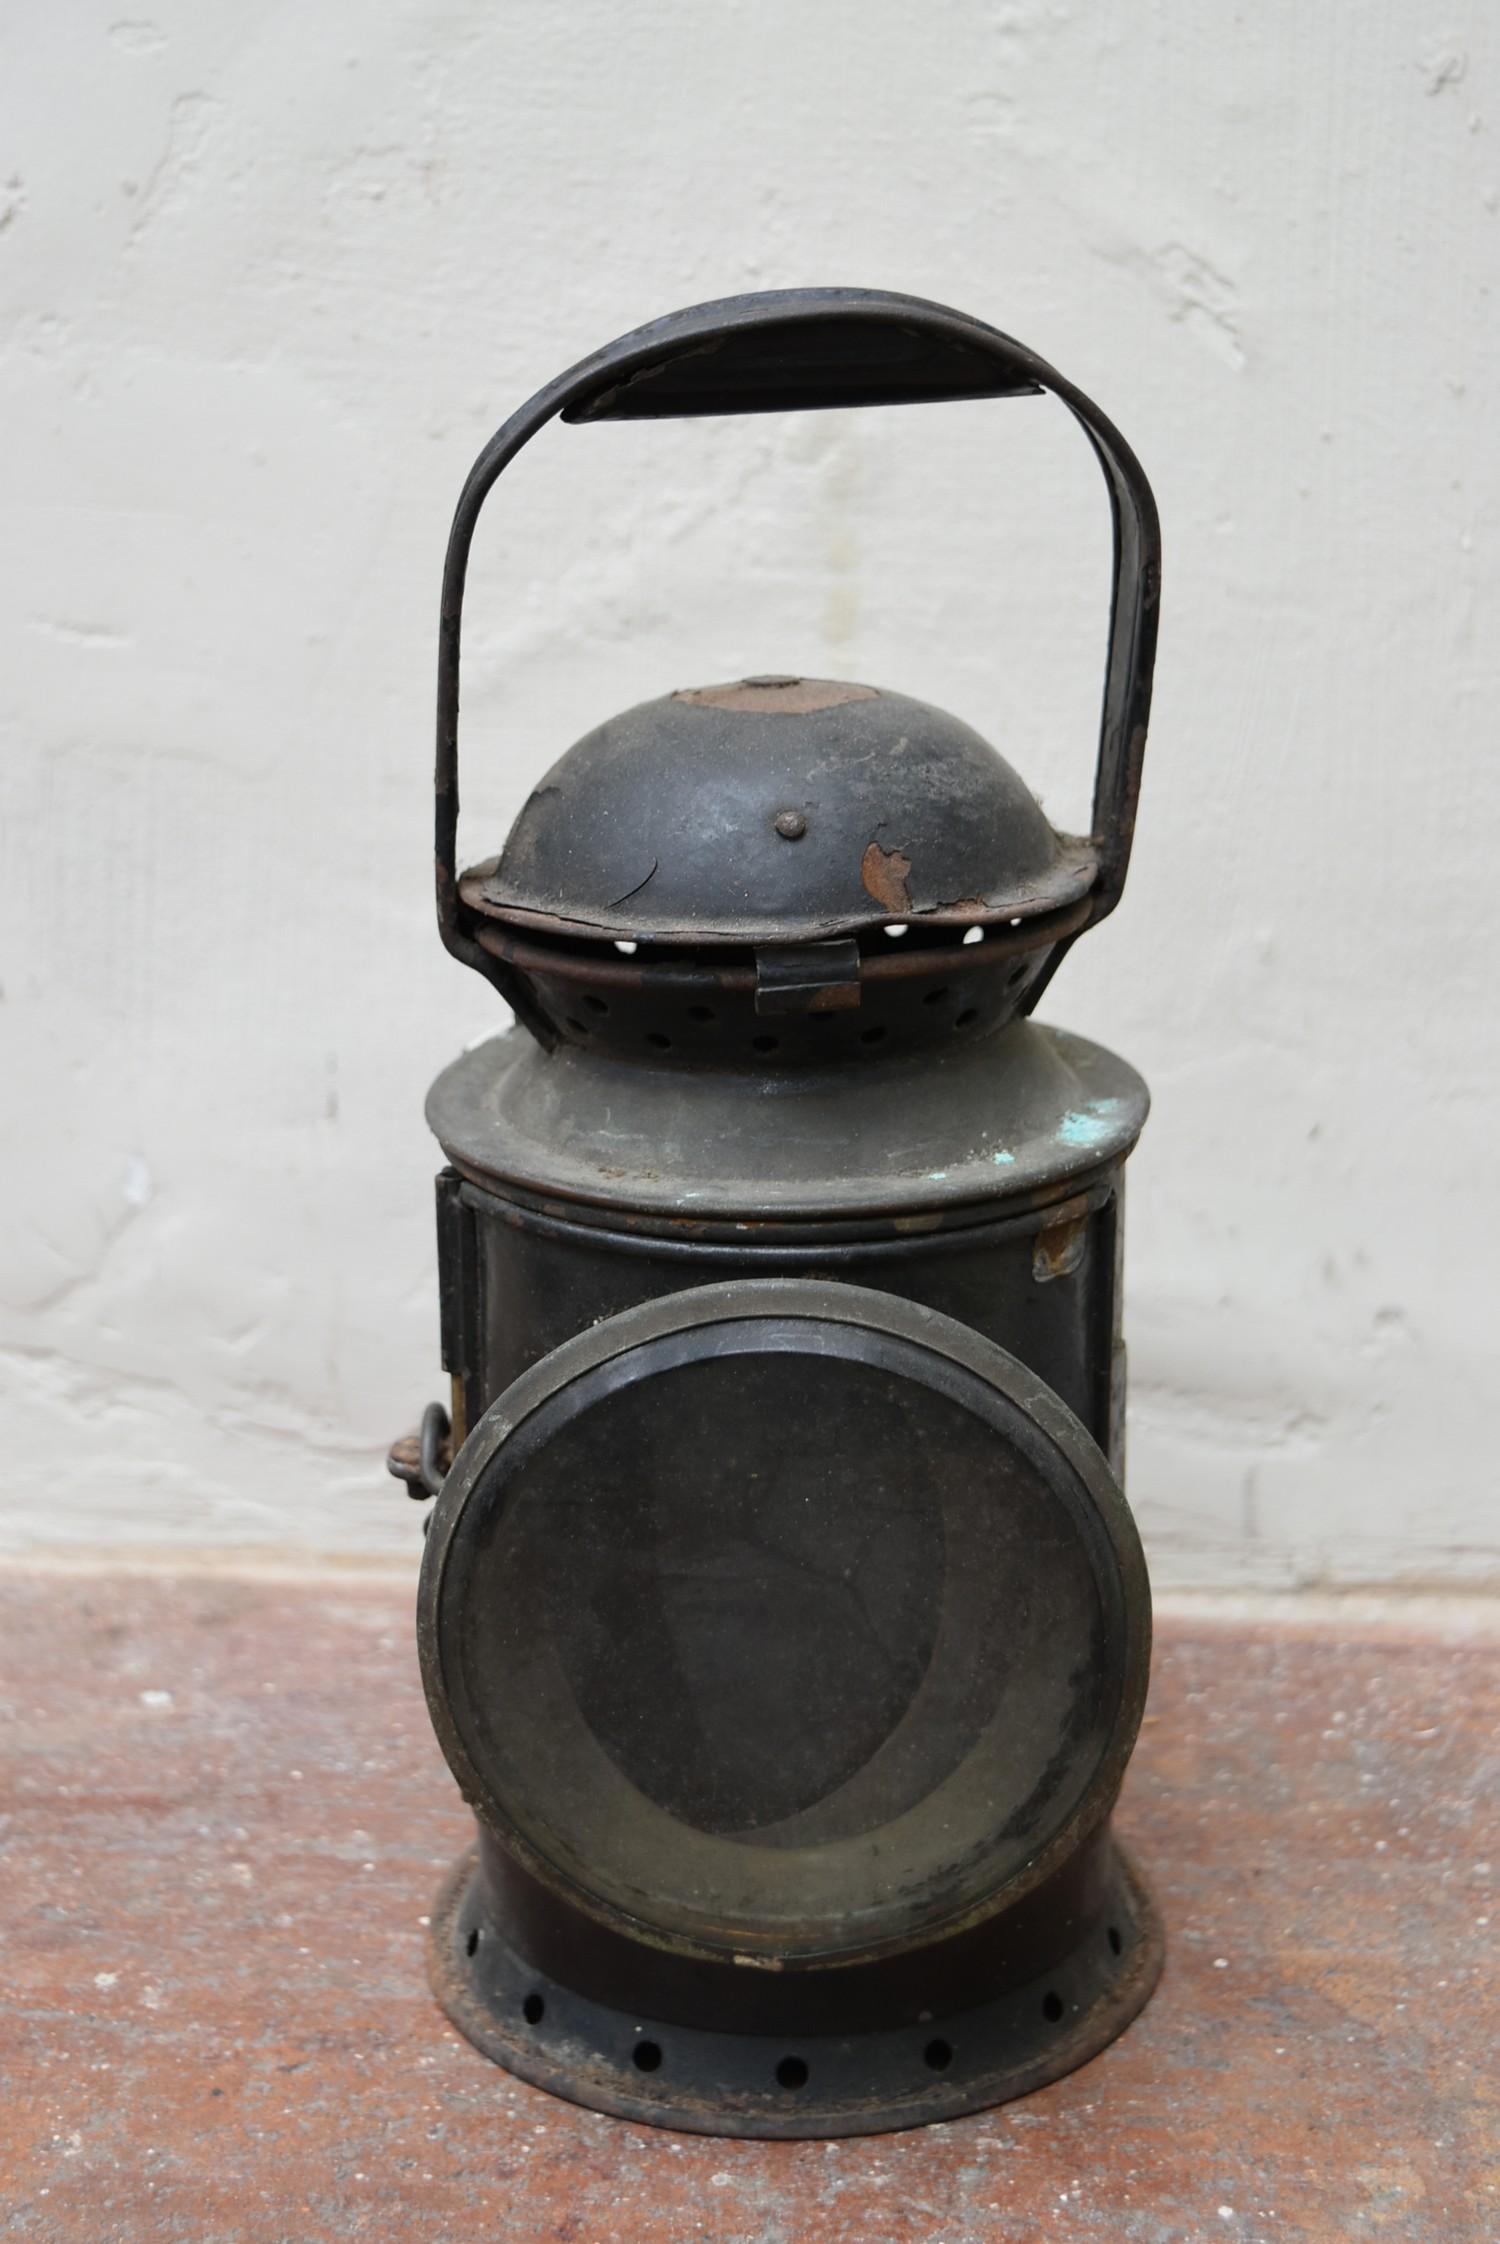 A vintage railwayman's metal cased signal lantern. H.32cm